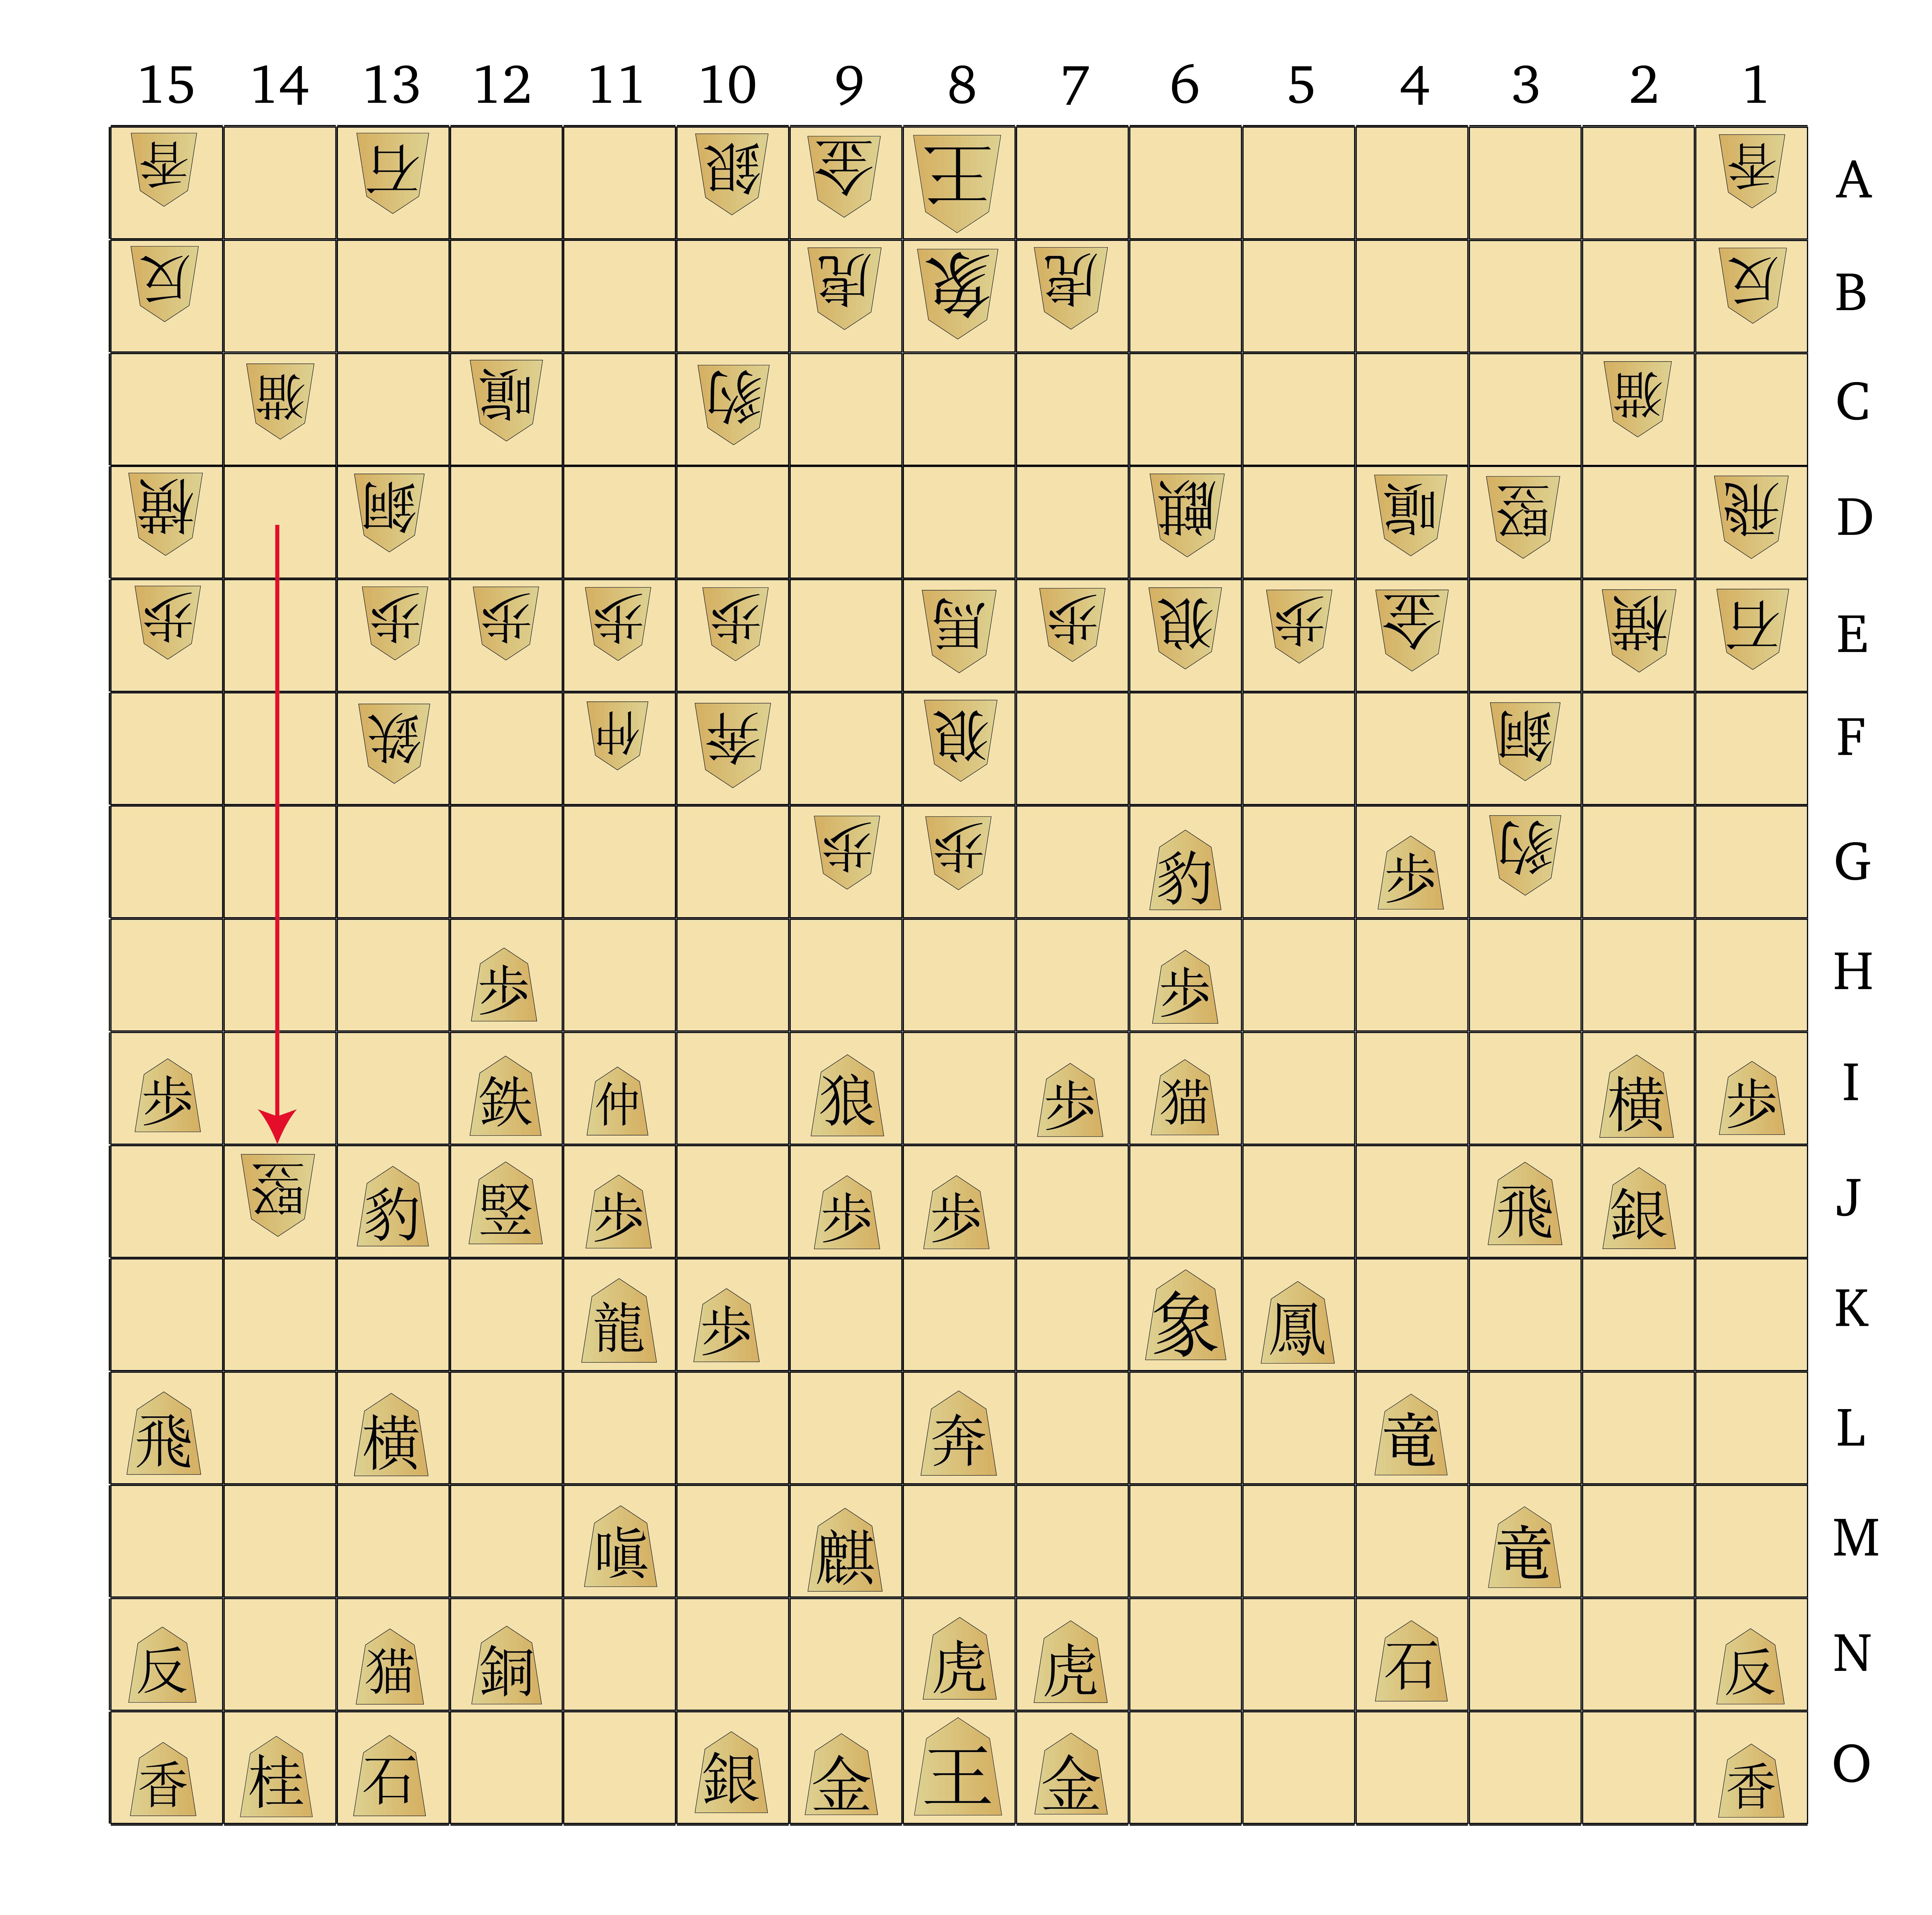 Dai Shogi 420 -- Move 290-01